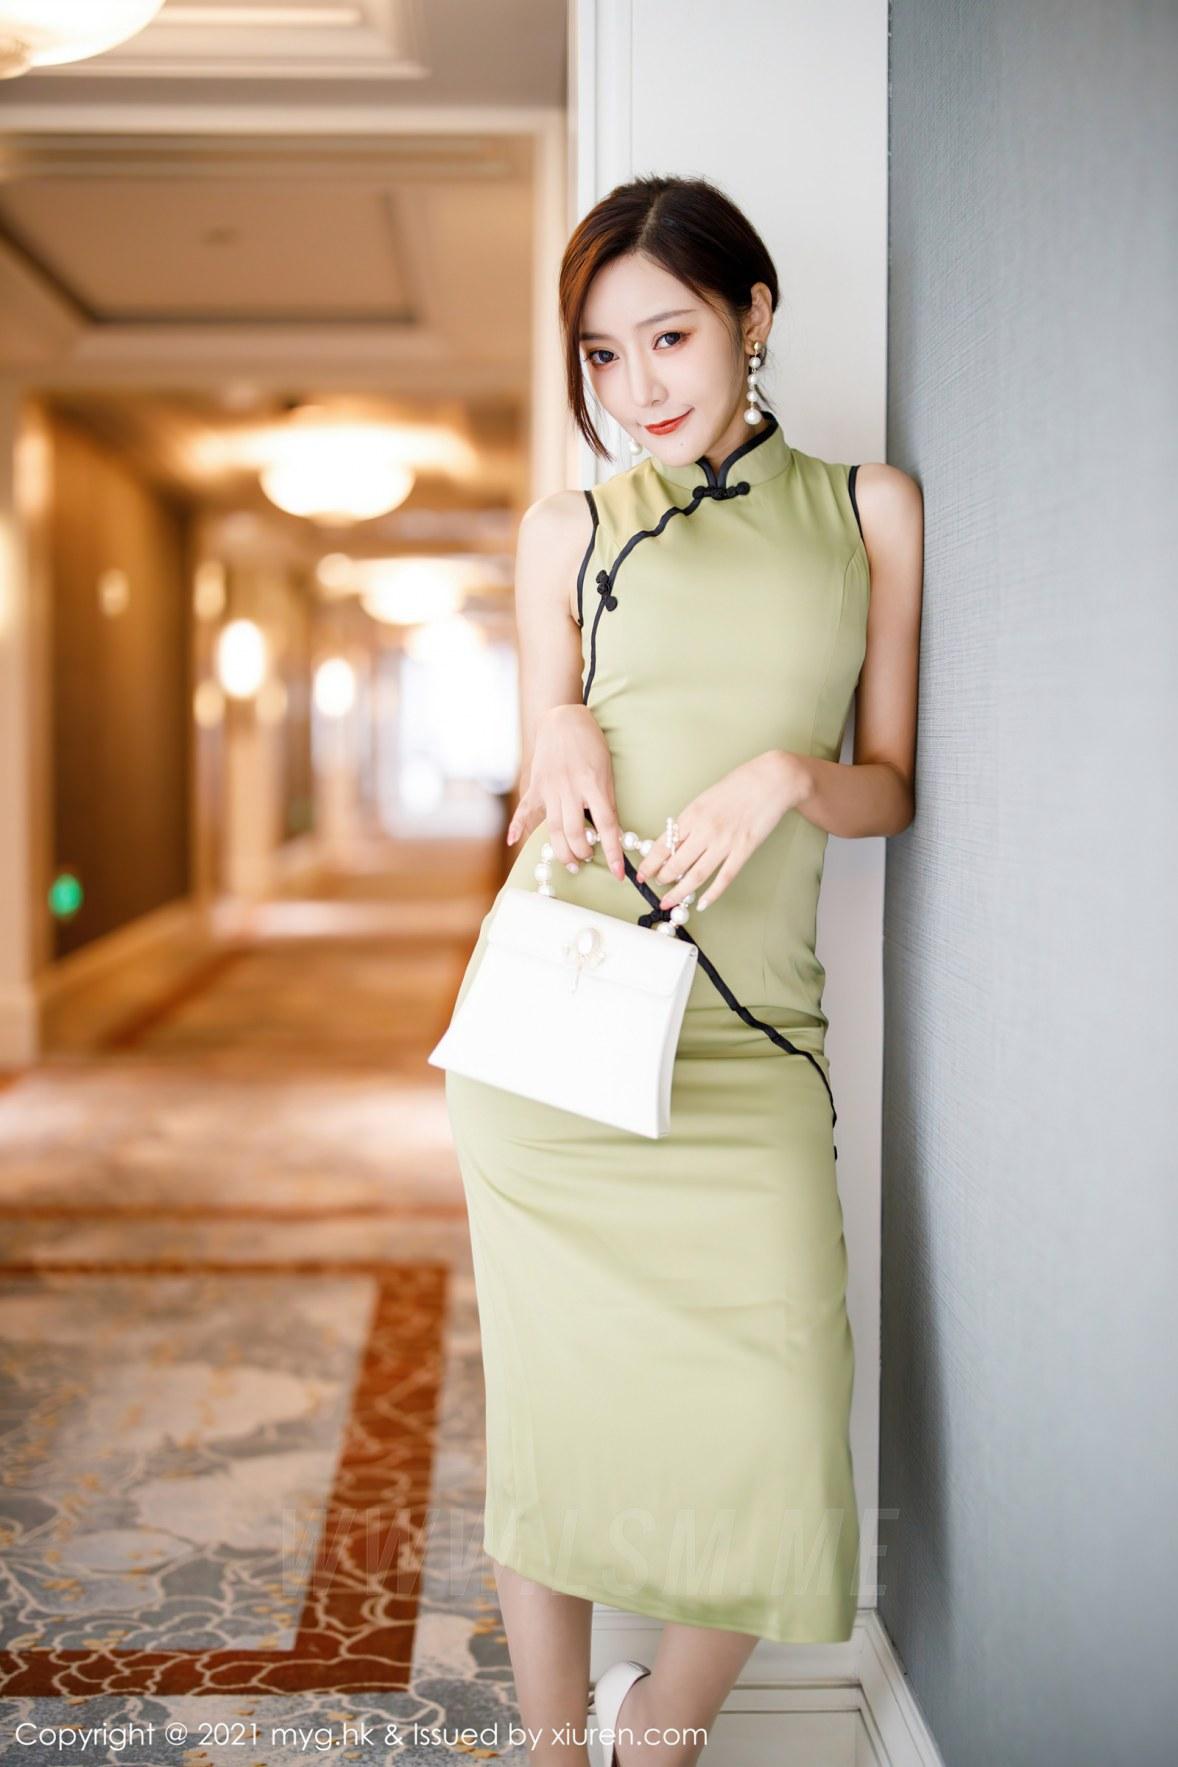 MyGirl 美媛馆 Vol.551 韵味旗袍 王馨瑶yanni 江浙沪旅拍3 - 4